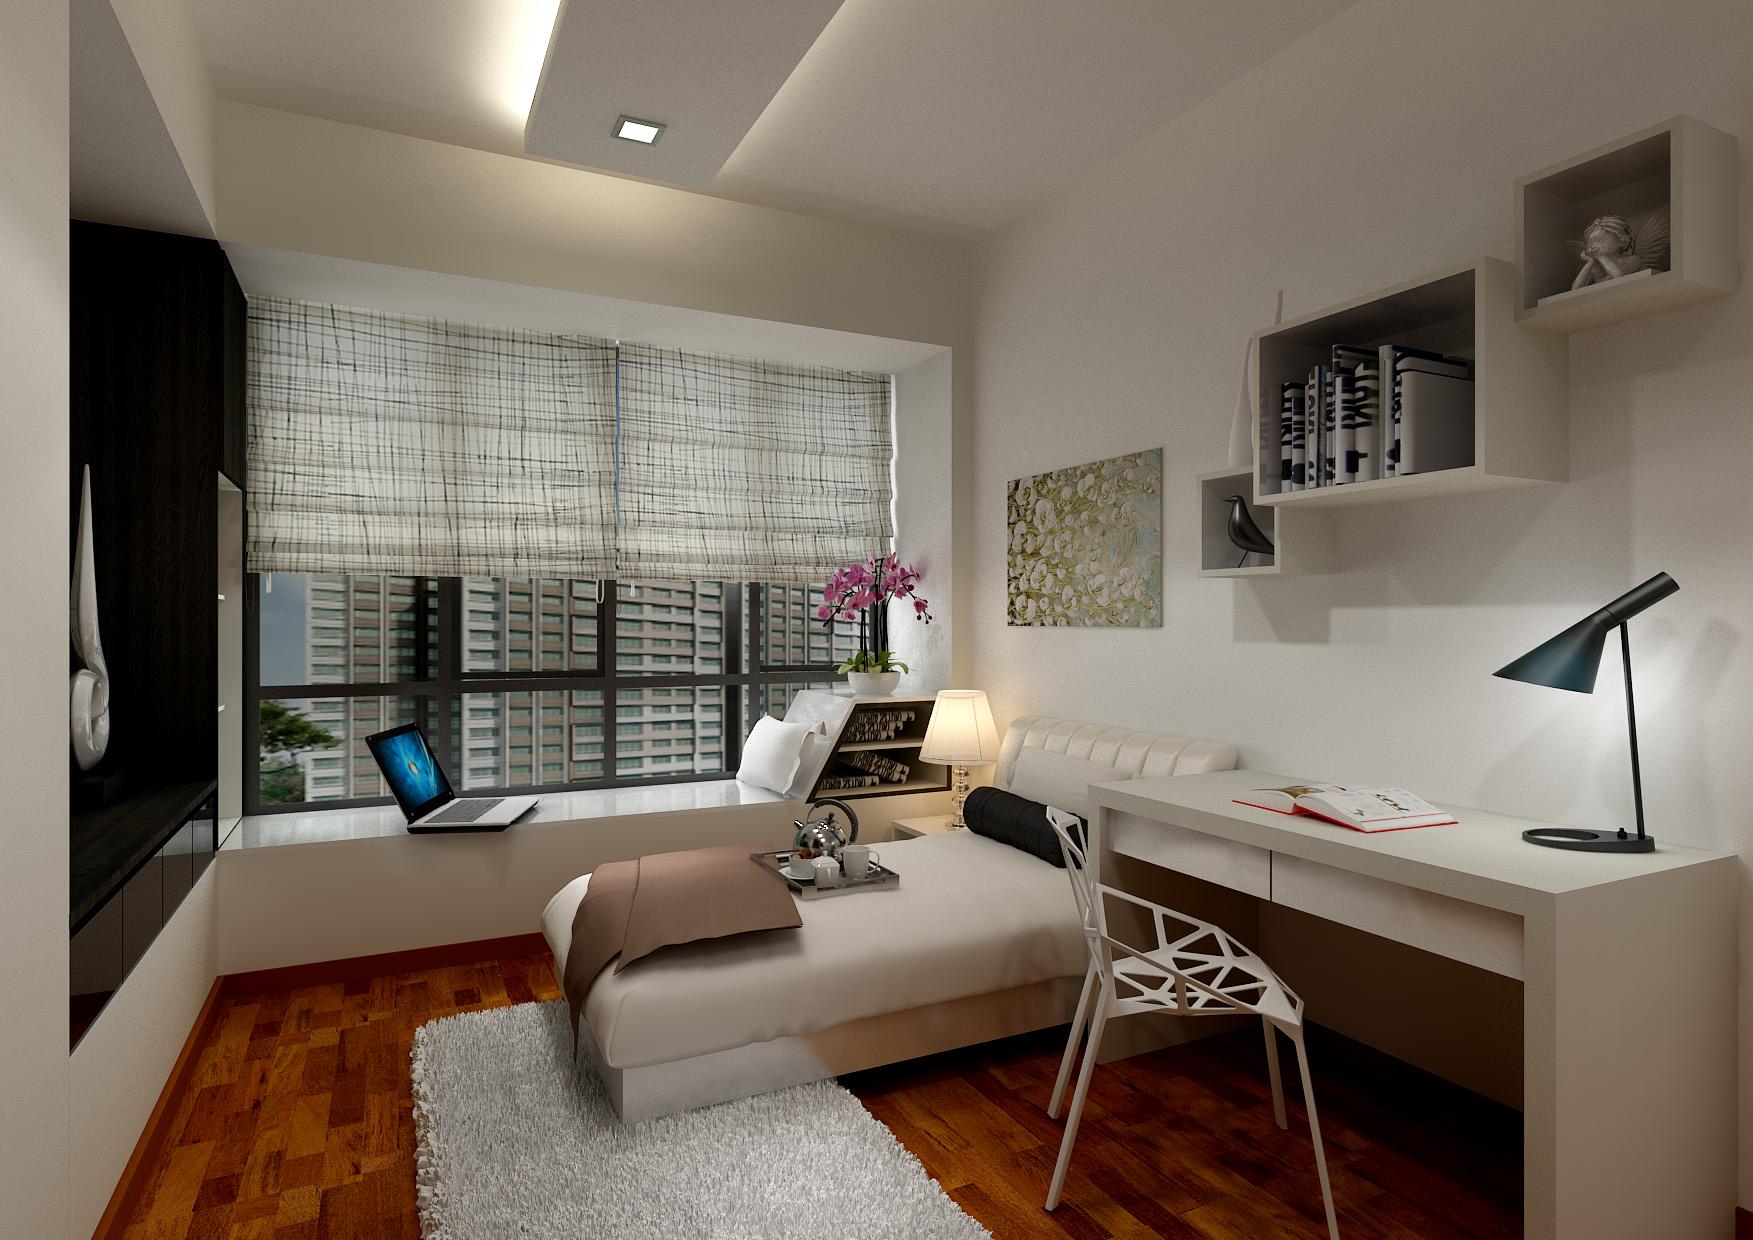 Houston interior design firms interior design firms for Interior design firms